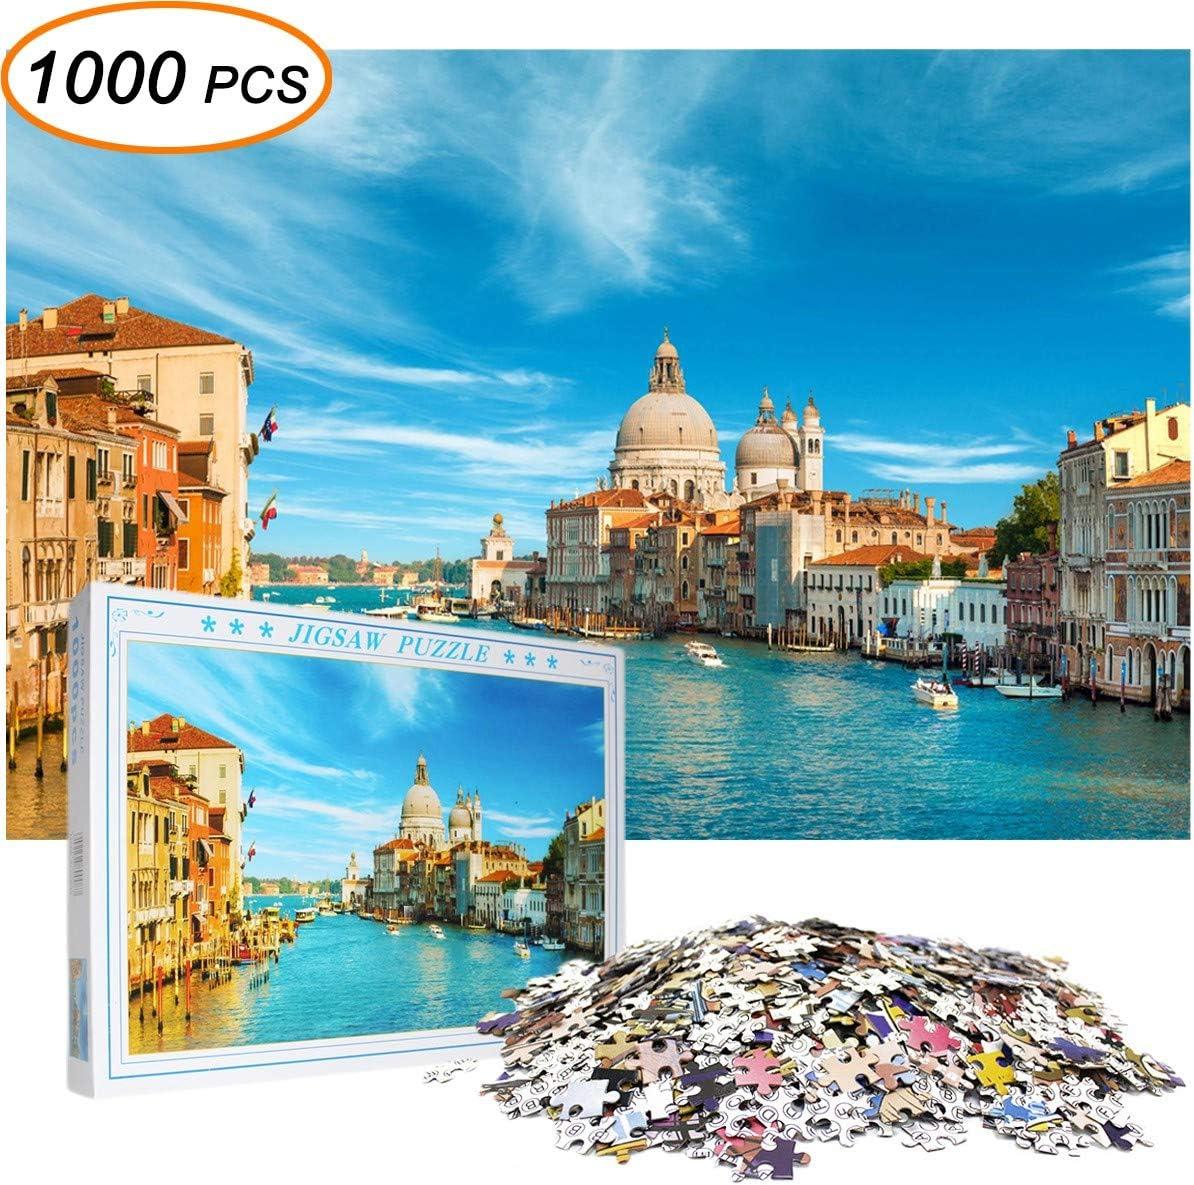 BAODANstore Jigsaw Puzzles for Adults Kids 1000 Pieces Big Ben London Bridge; 1059 Venice; Big Ben